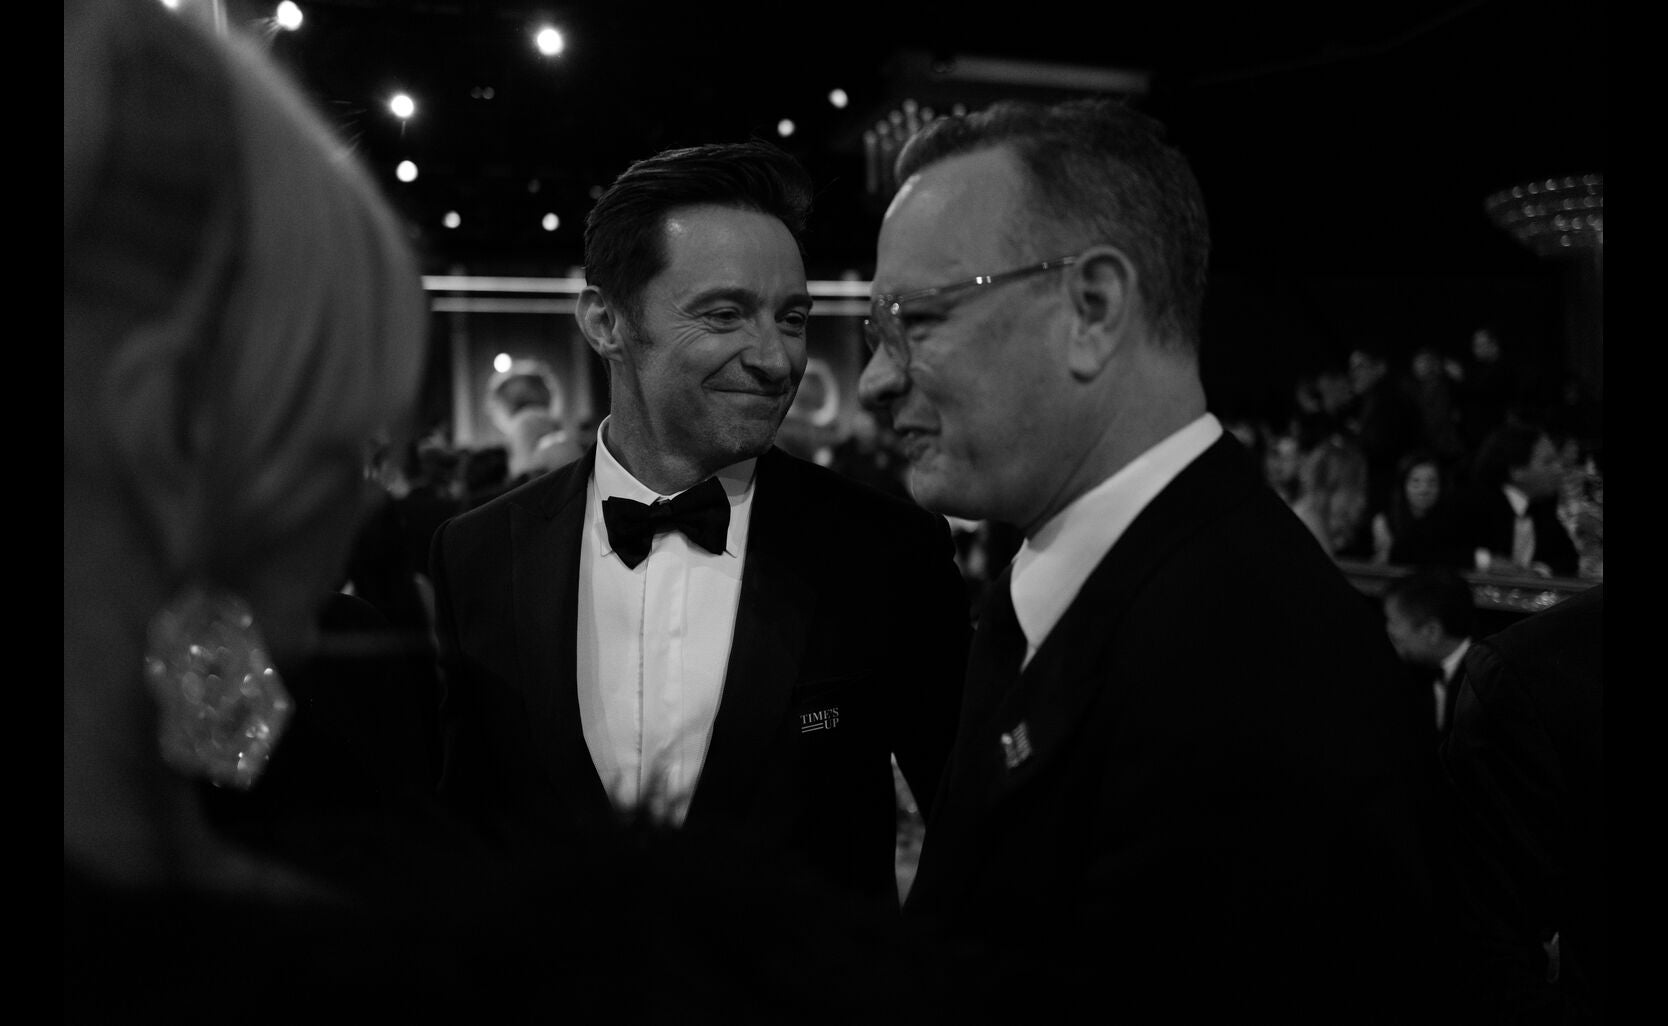 Hugh Jackman and Tom Hanks